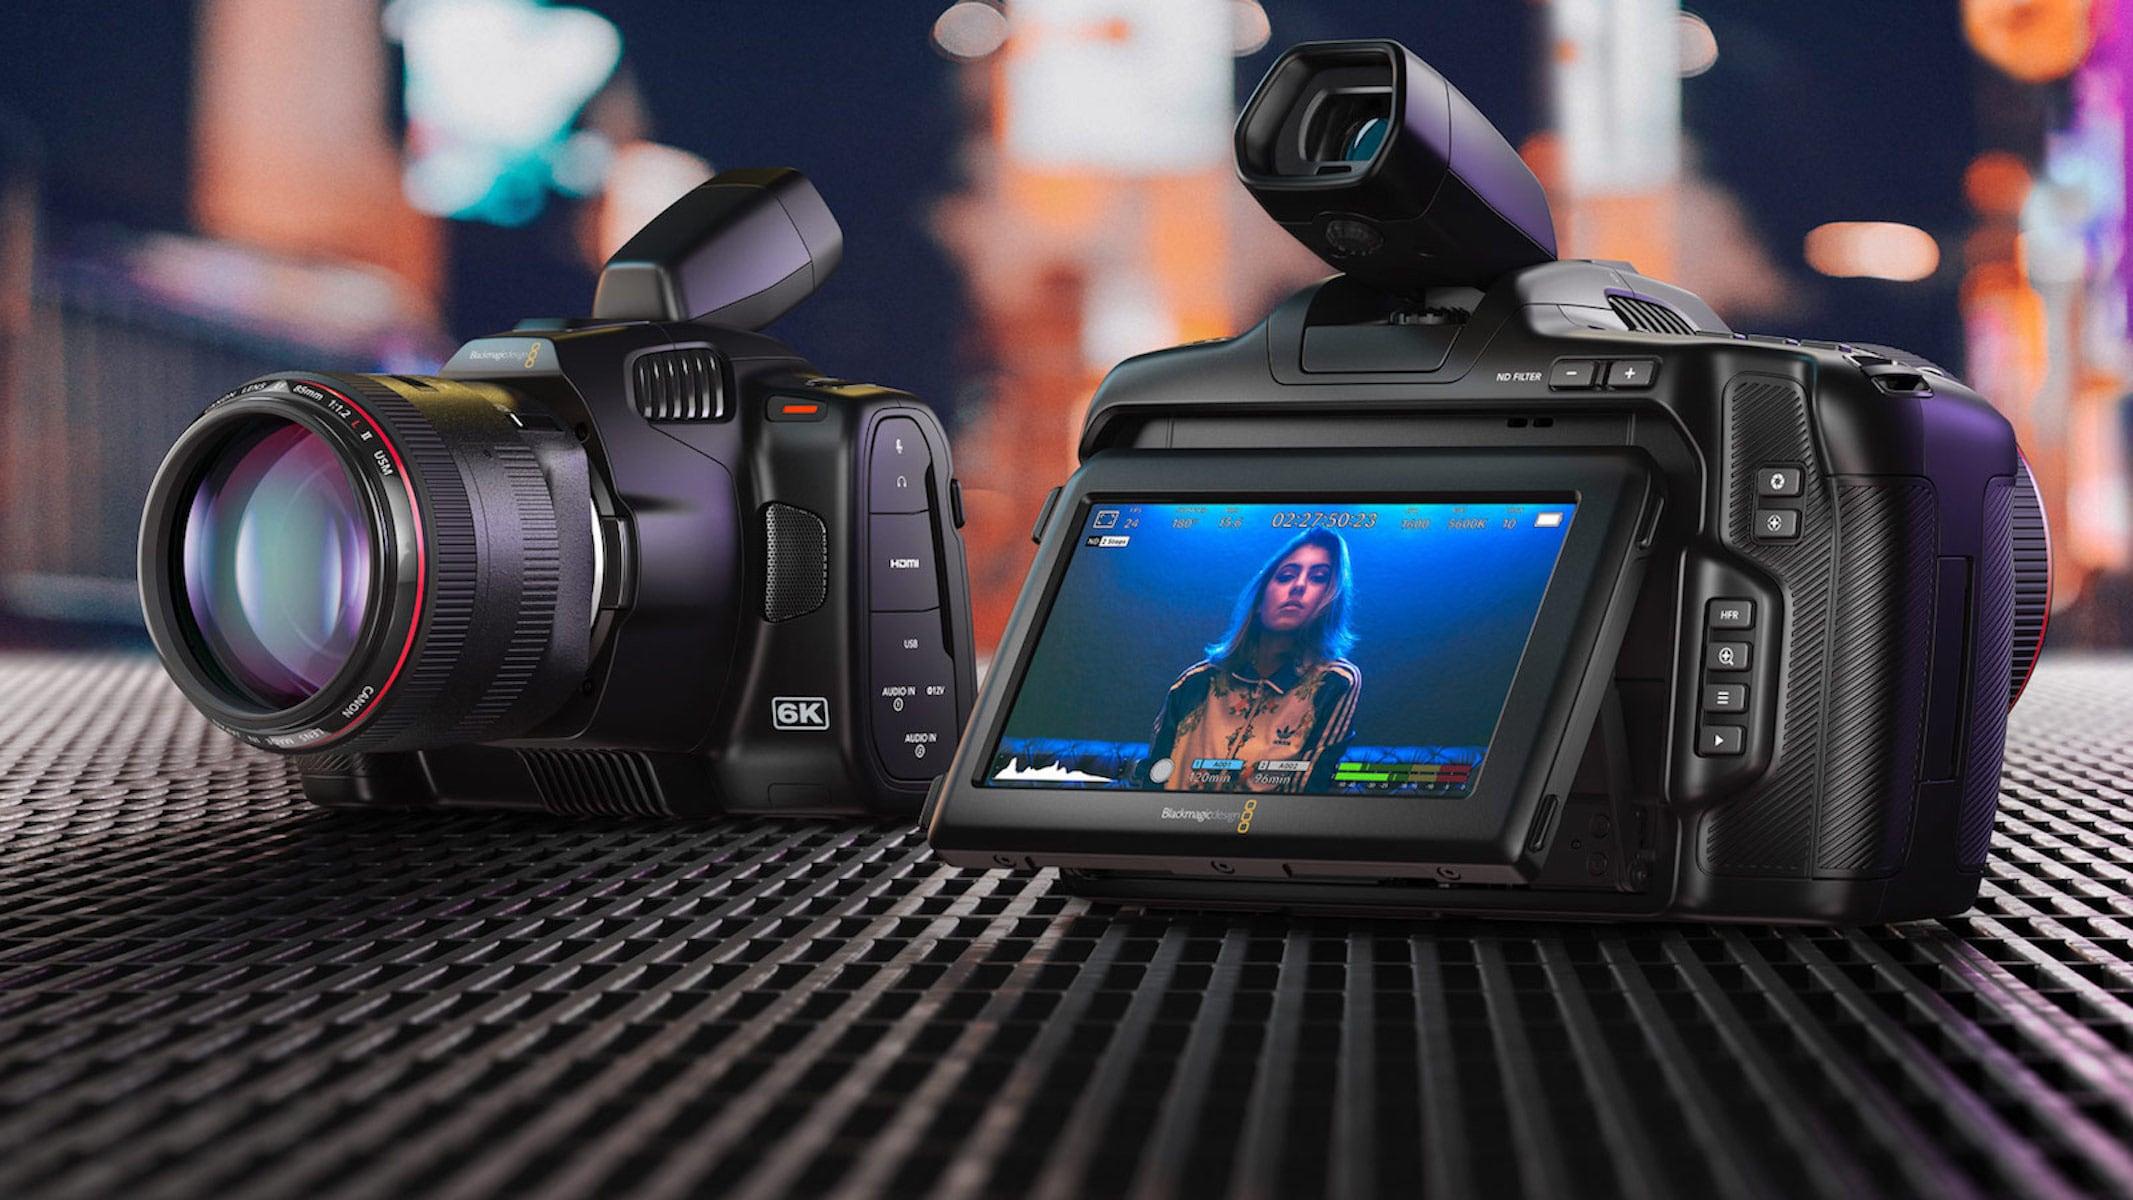 Blackmagic's new 'Pro' Pocket Cinema Camera 6K adds back the tilt-screen